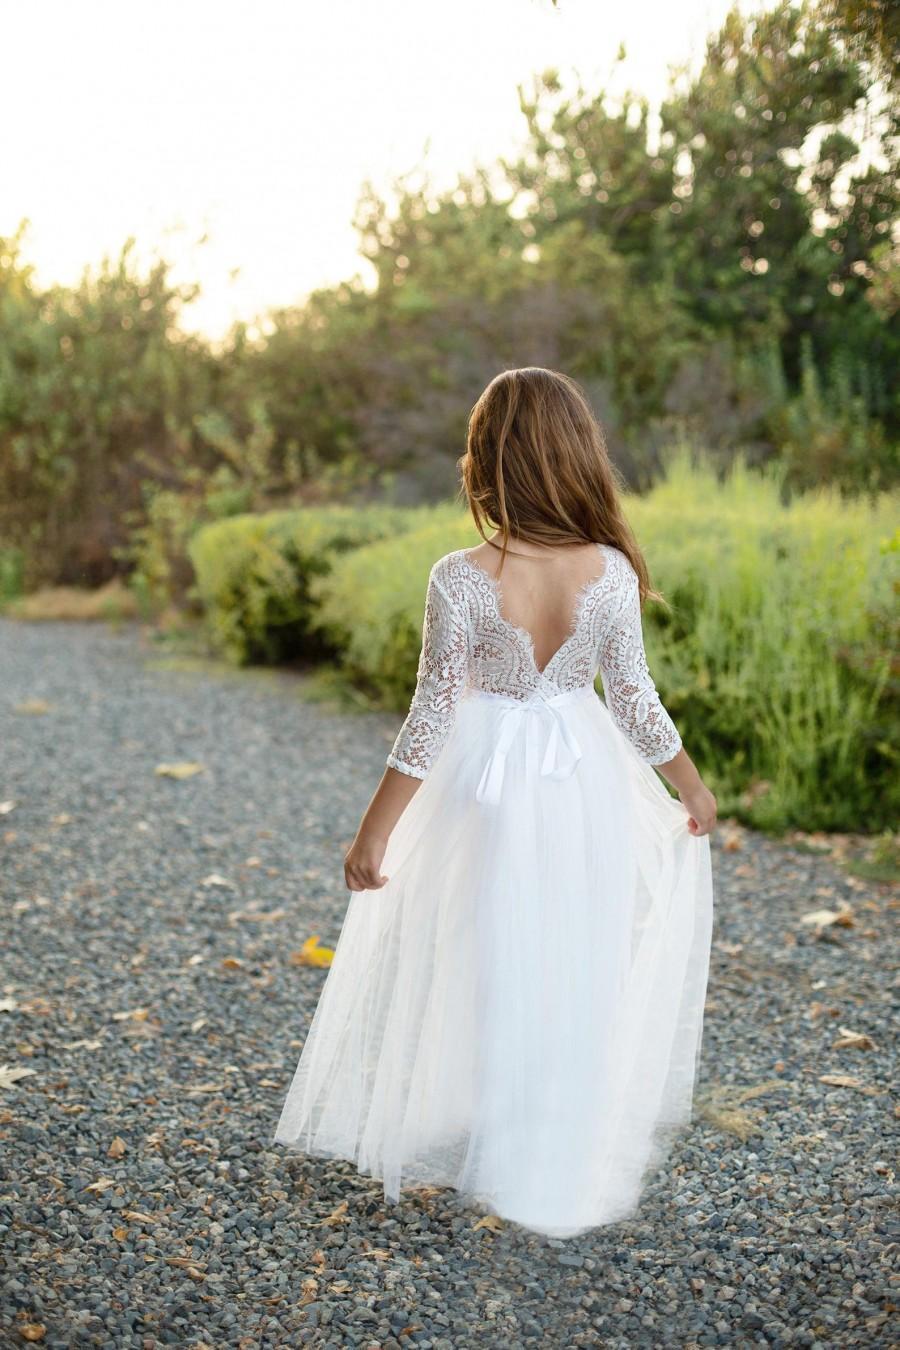 Hochzeit - Bohemian Boho Flower girl dress , Long sleeve flower girl dress, Tulle flower girl dress, Rustic flower girl dress, Boho flower girl dress